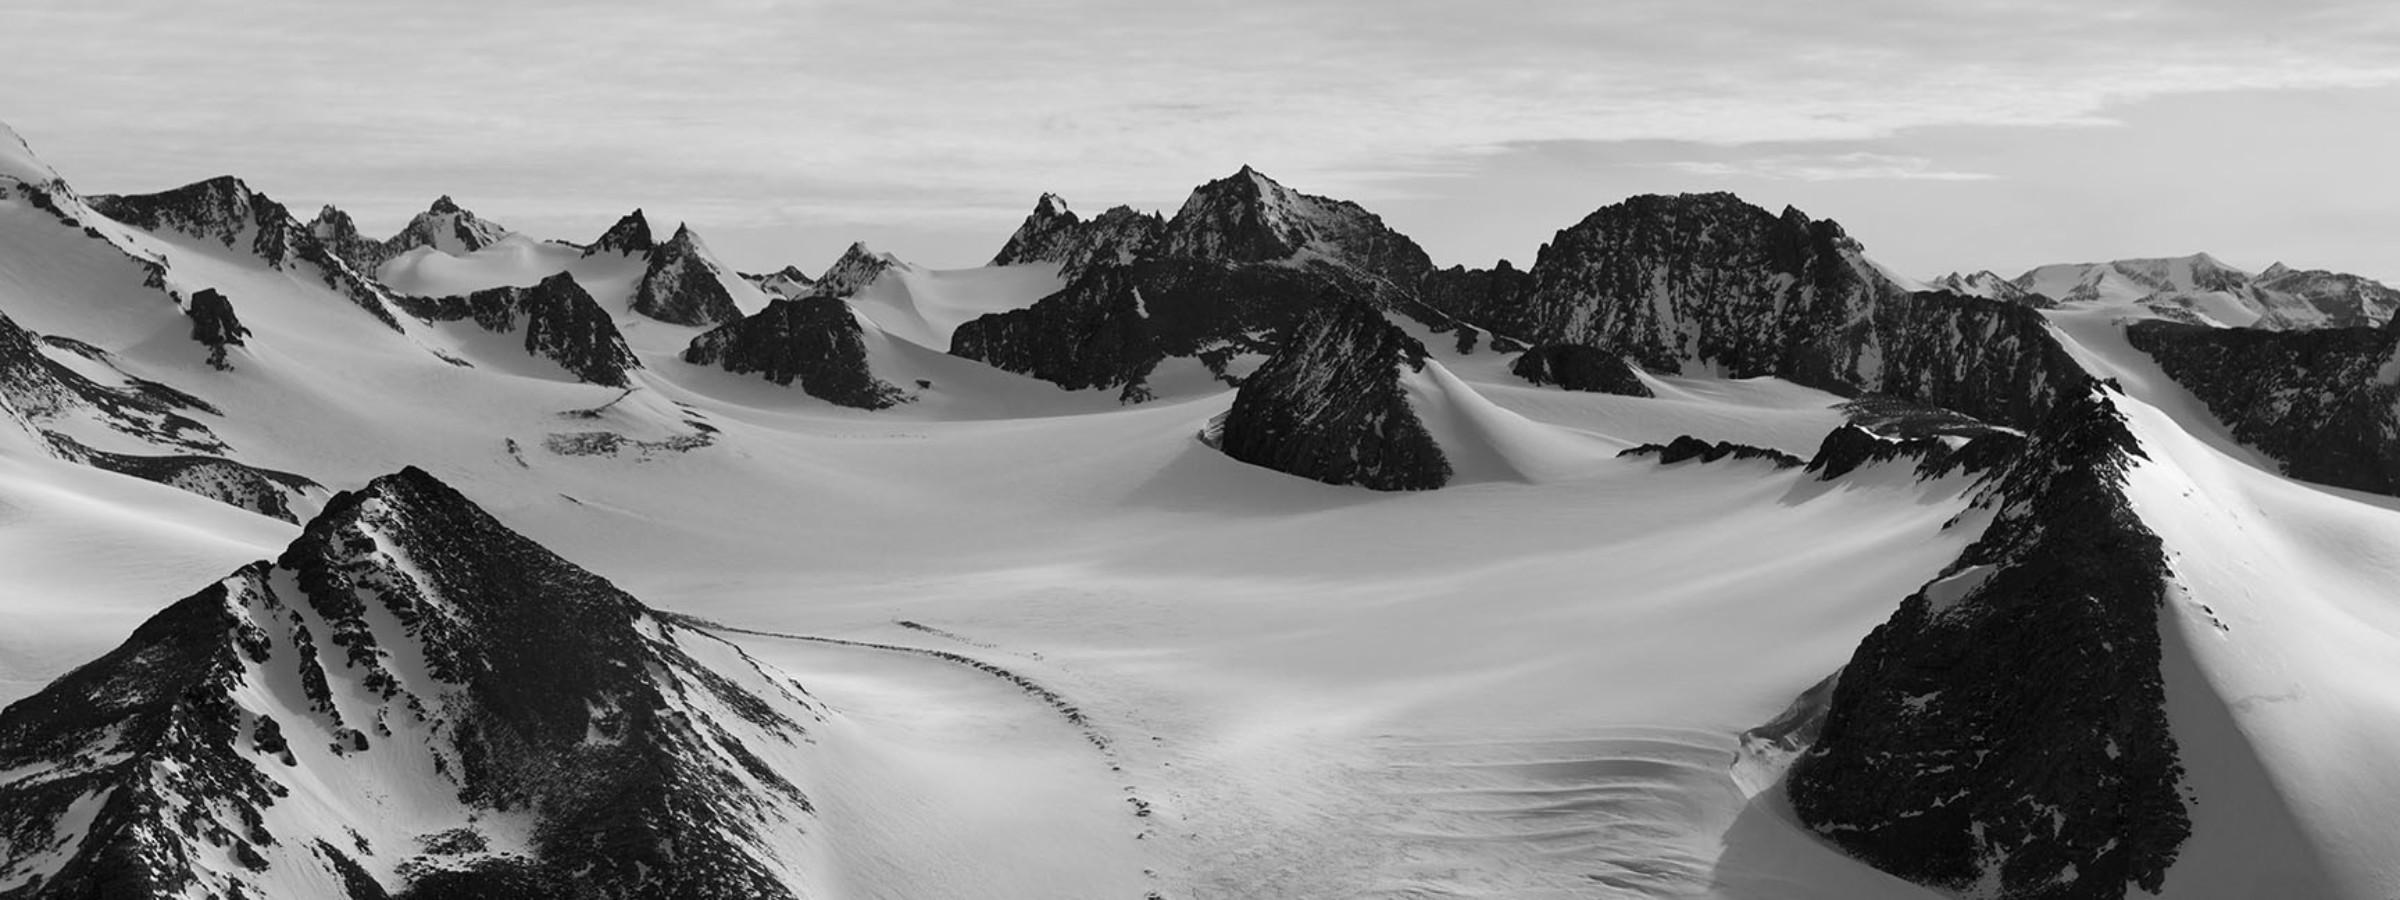 South Pole Documentation, 2015